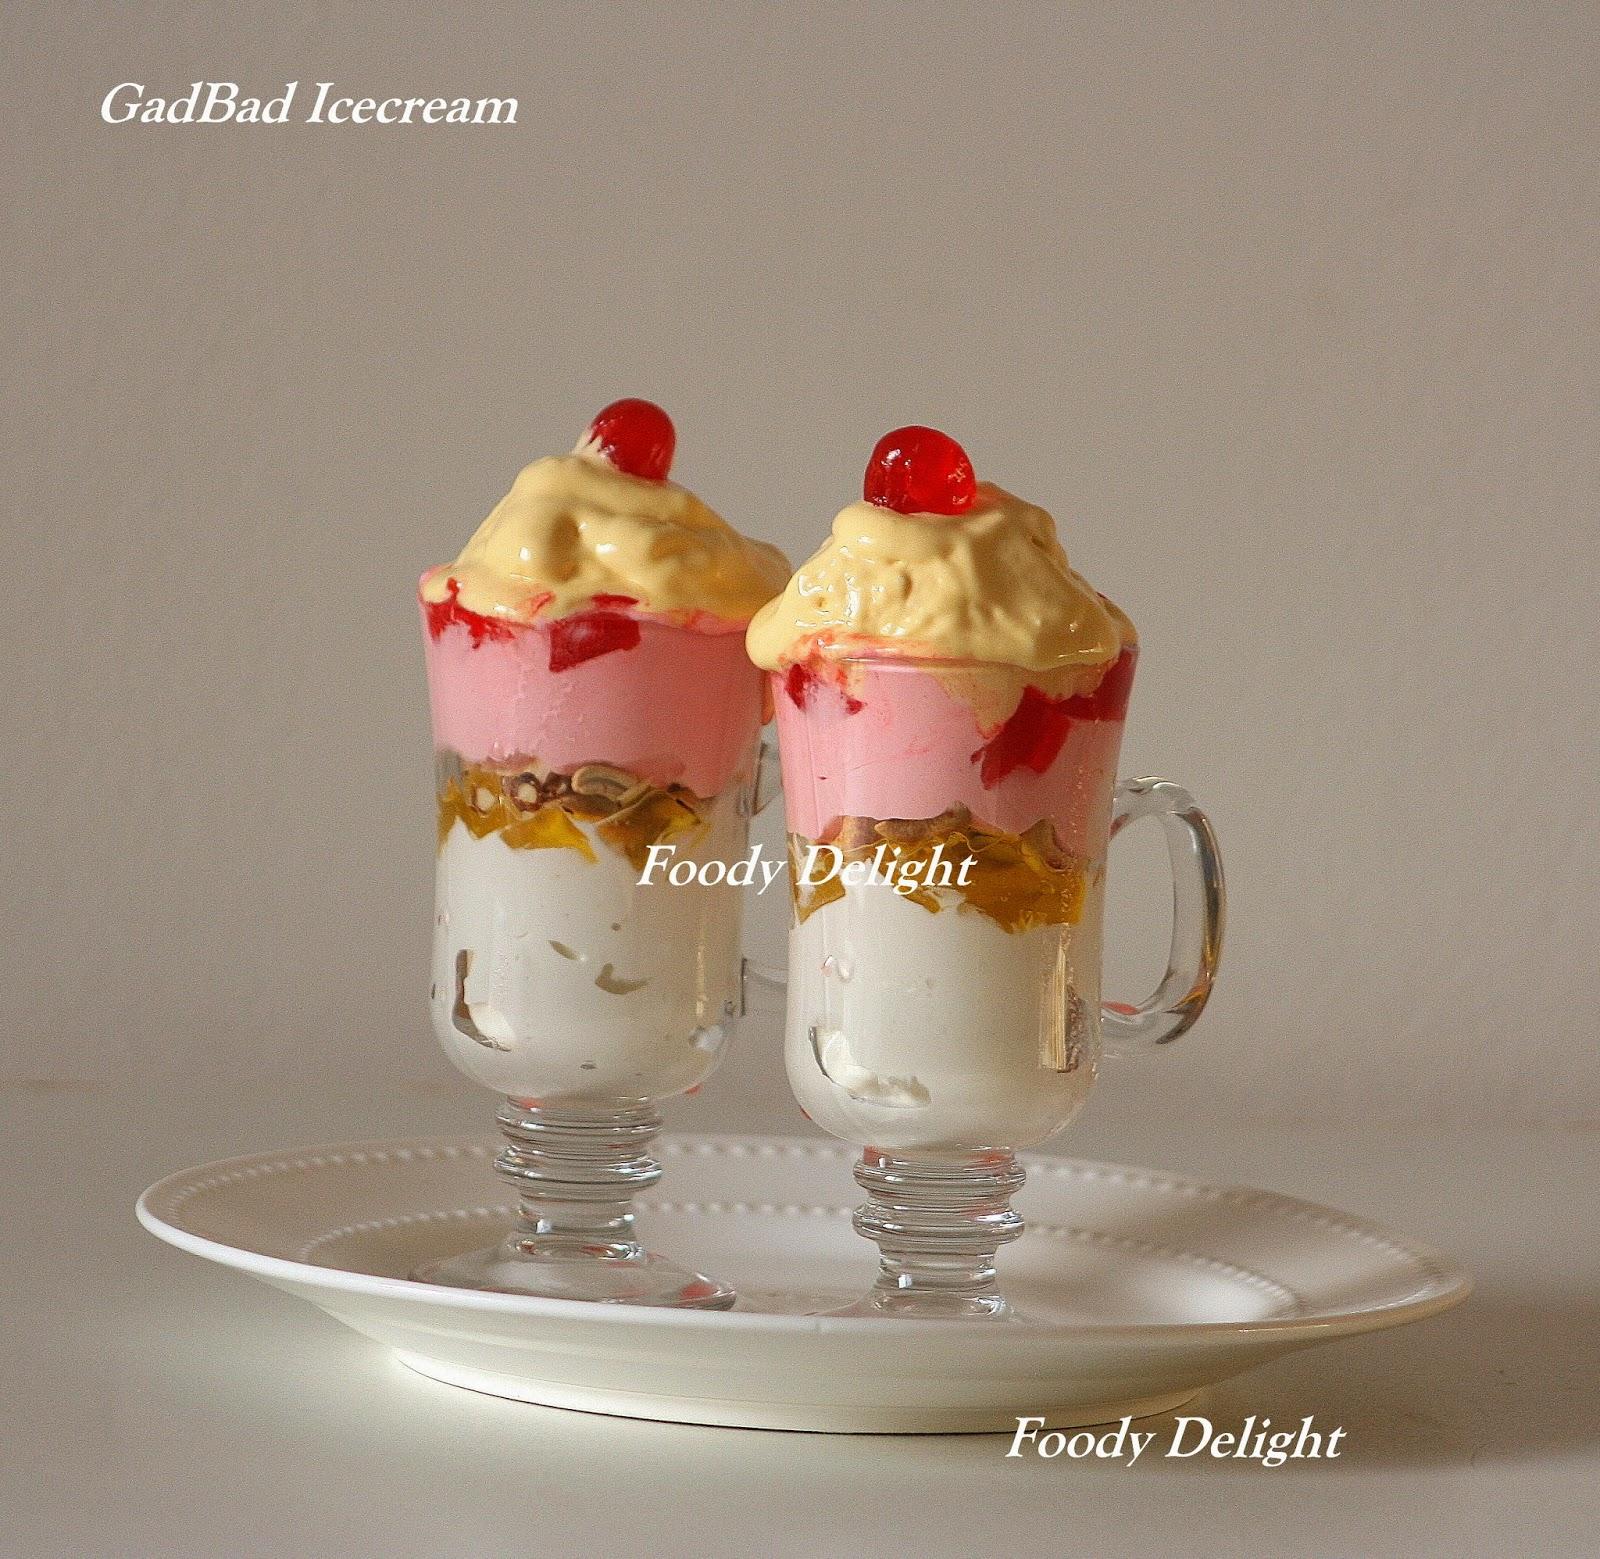 Foody delight gadbad icecream a special icecream of karnataka gadbad icecream a special icecream of karnataka ccuart Choice Image